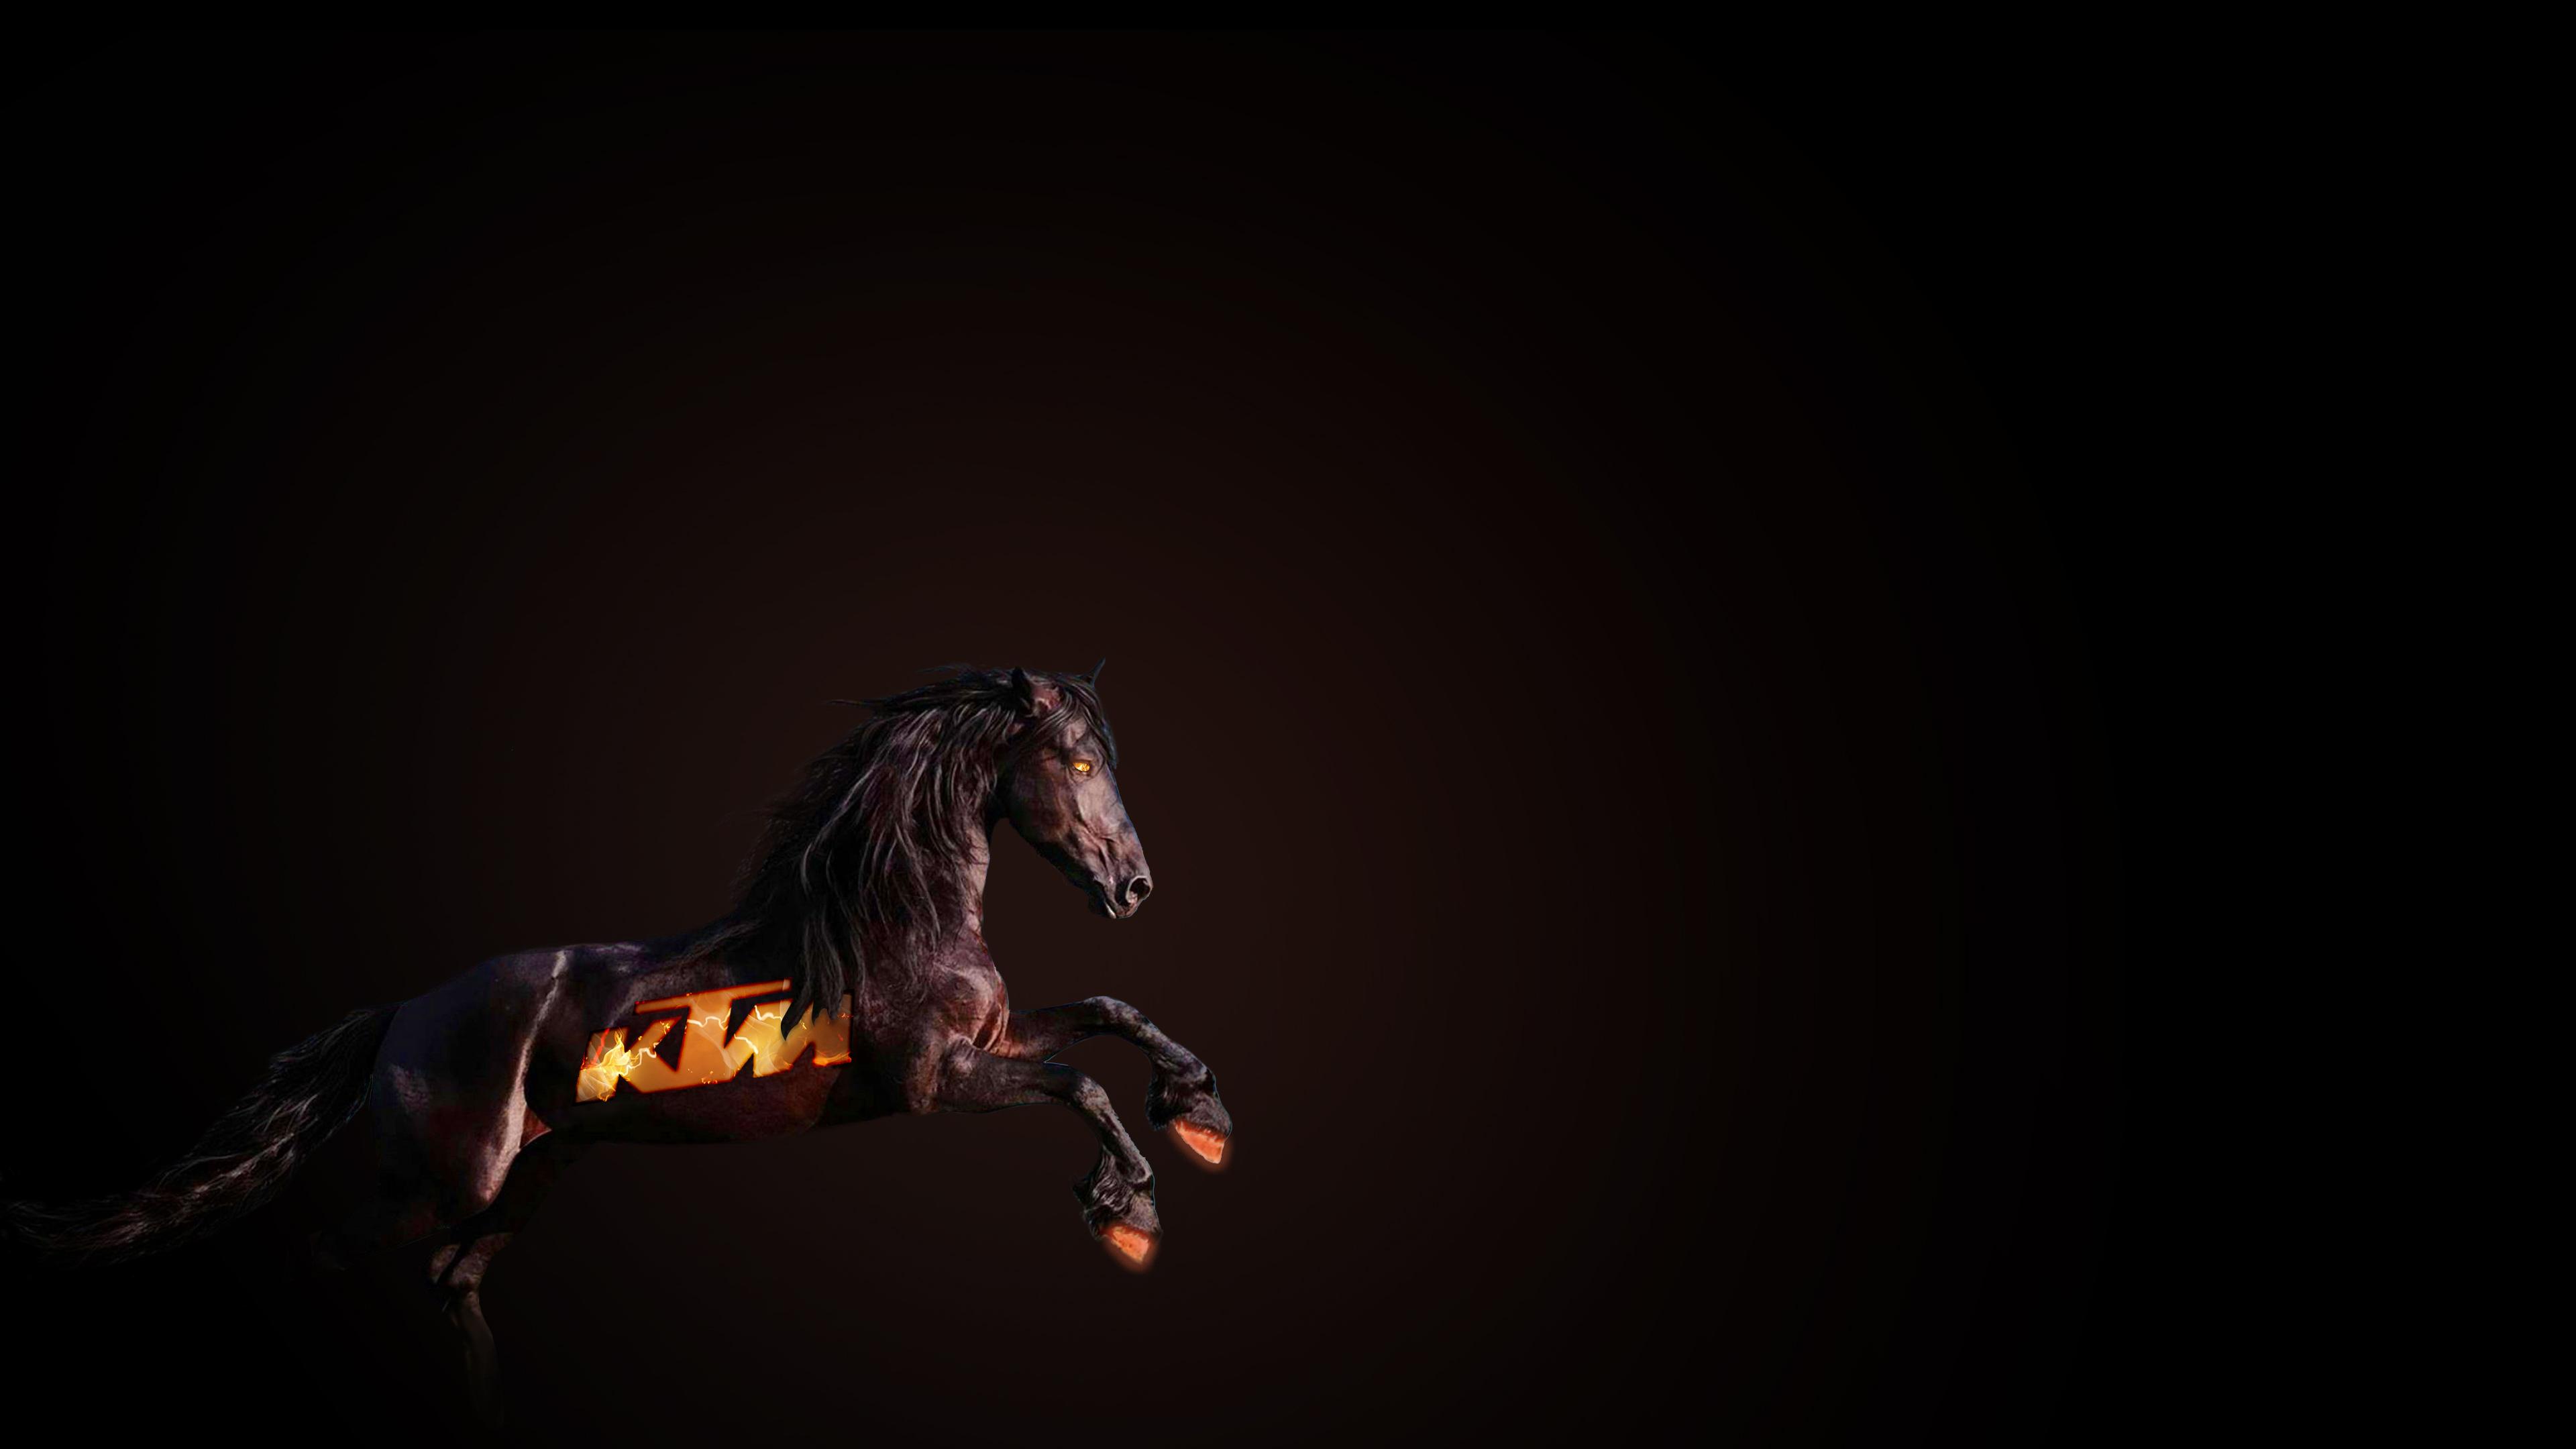 ktm horse 1575663229 - Ktm Horse -